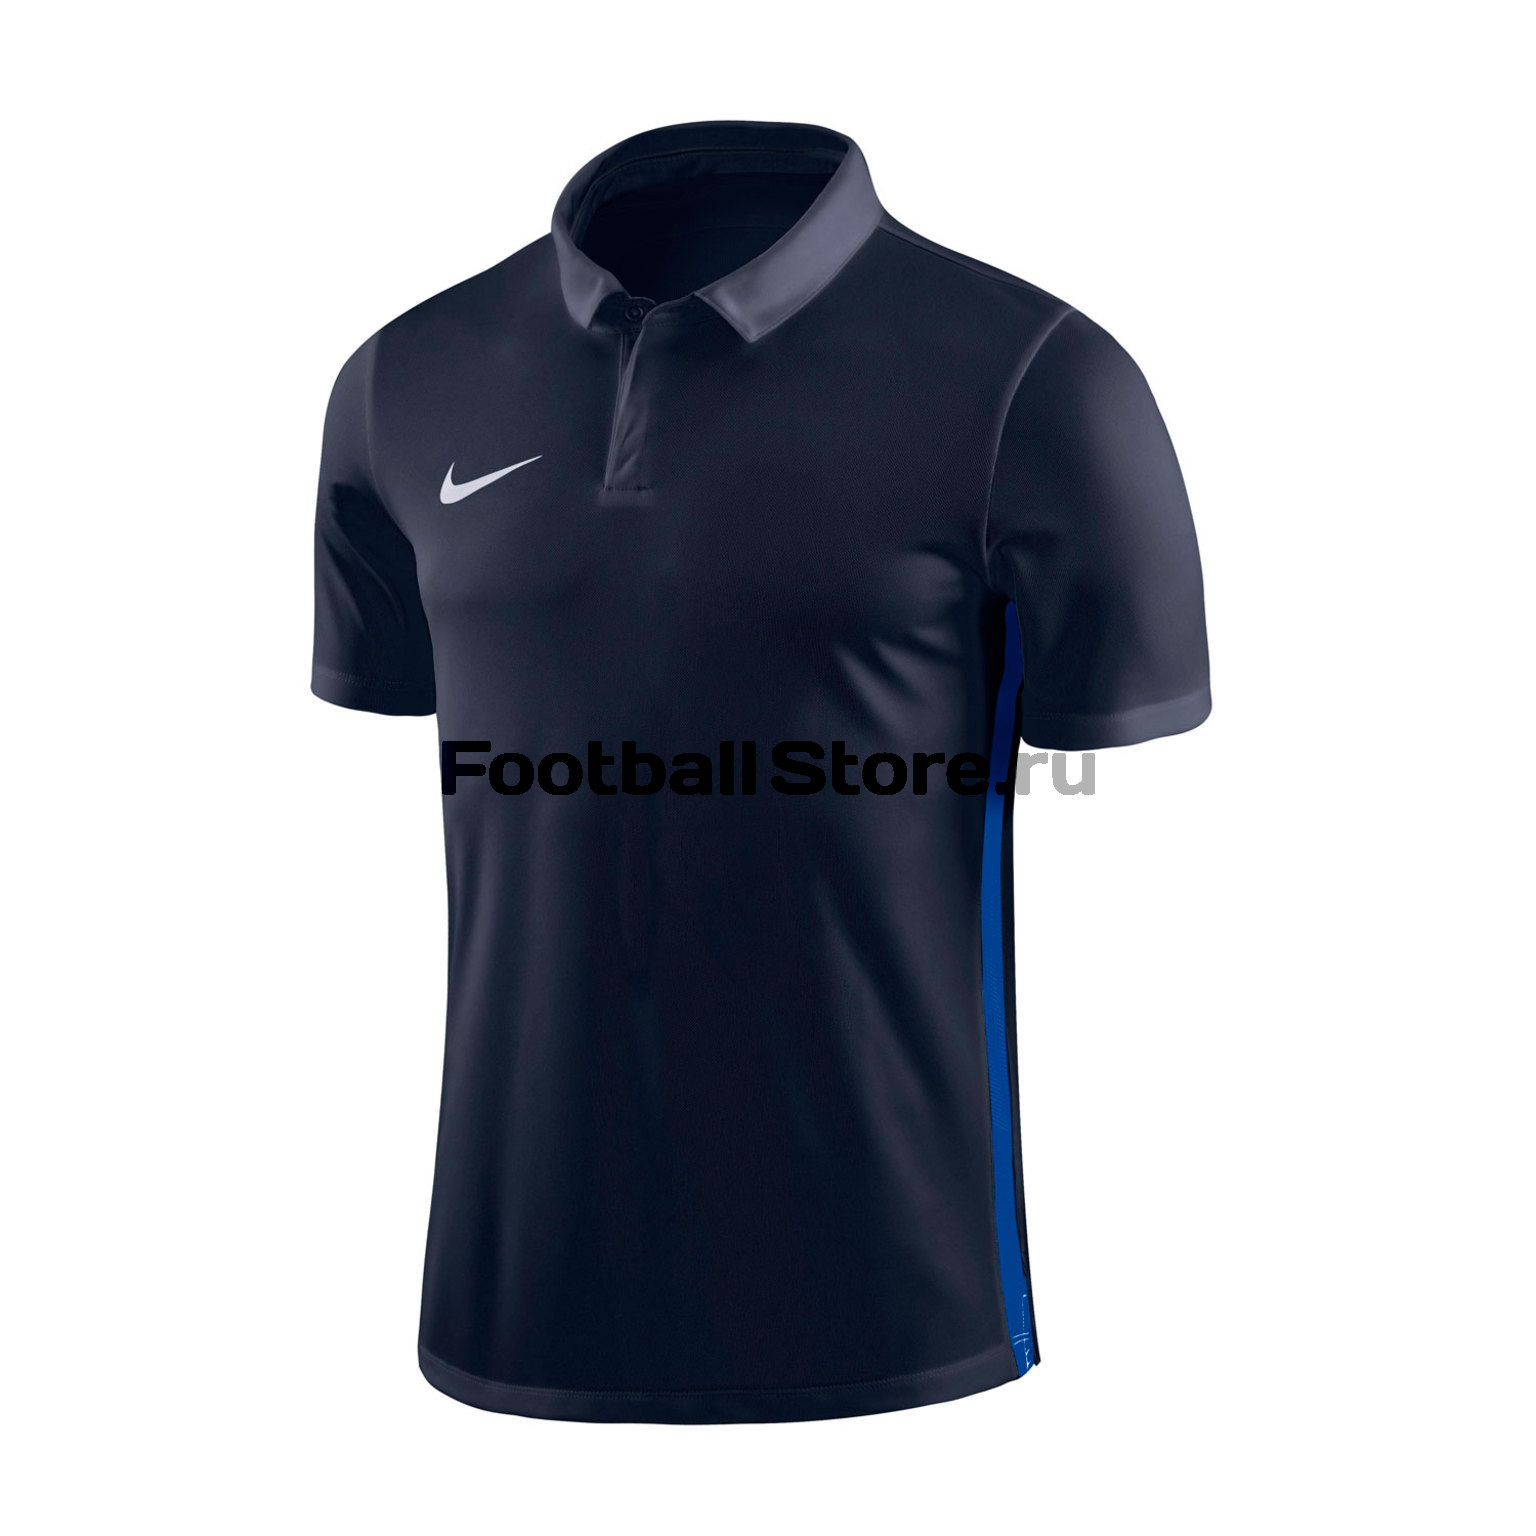 Поло Nike YTH Academy18 Dry Polo 899991-451